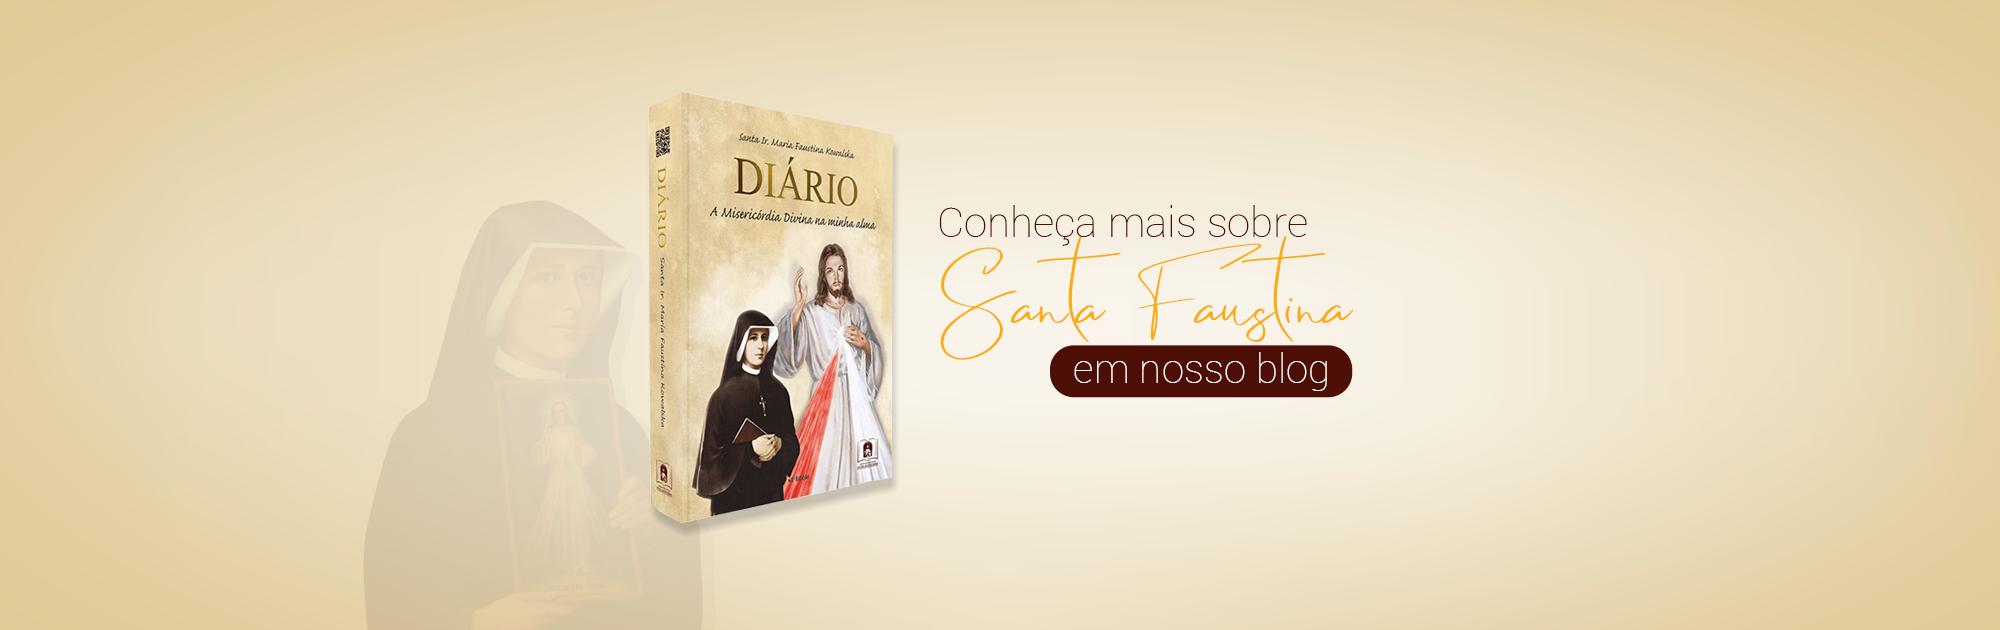 Banner-2-Blog-2000x630-Frases-inspiradoras-de-Santa-Faustina-Santuário-da-Divina-Misericórdia-1